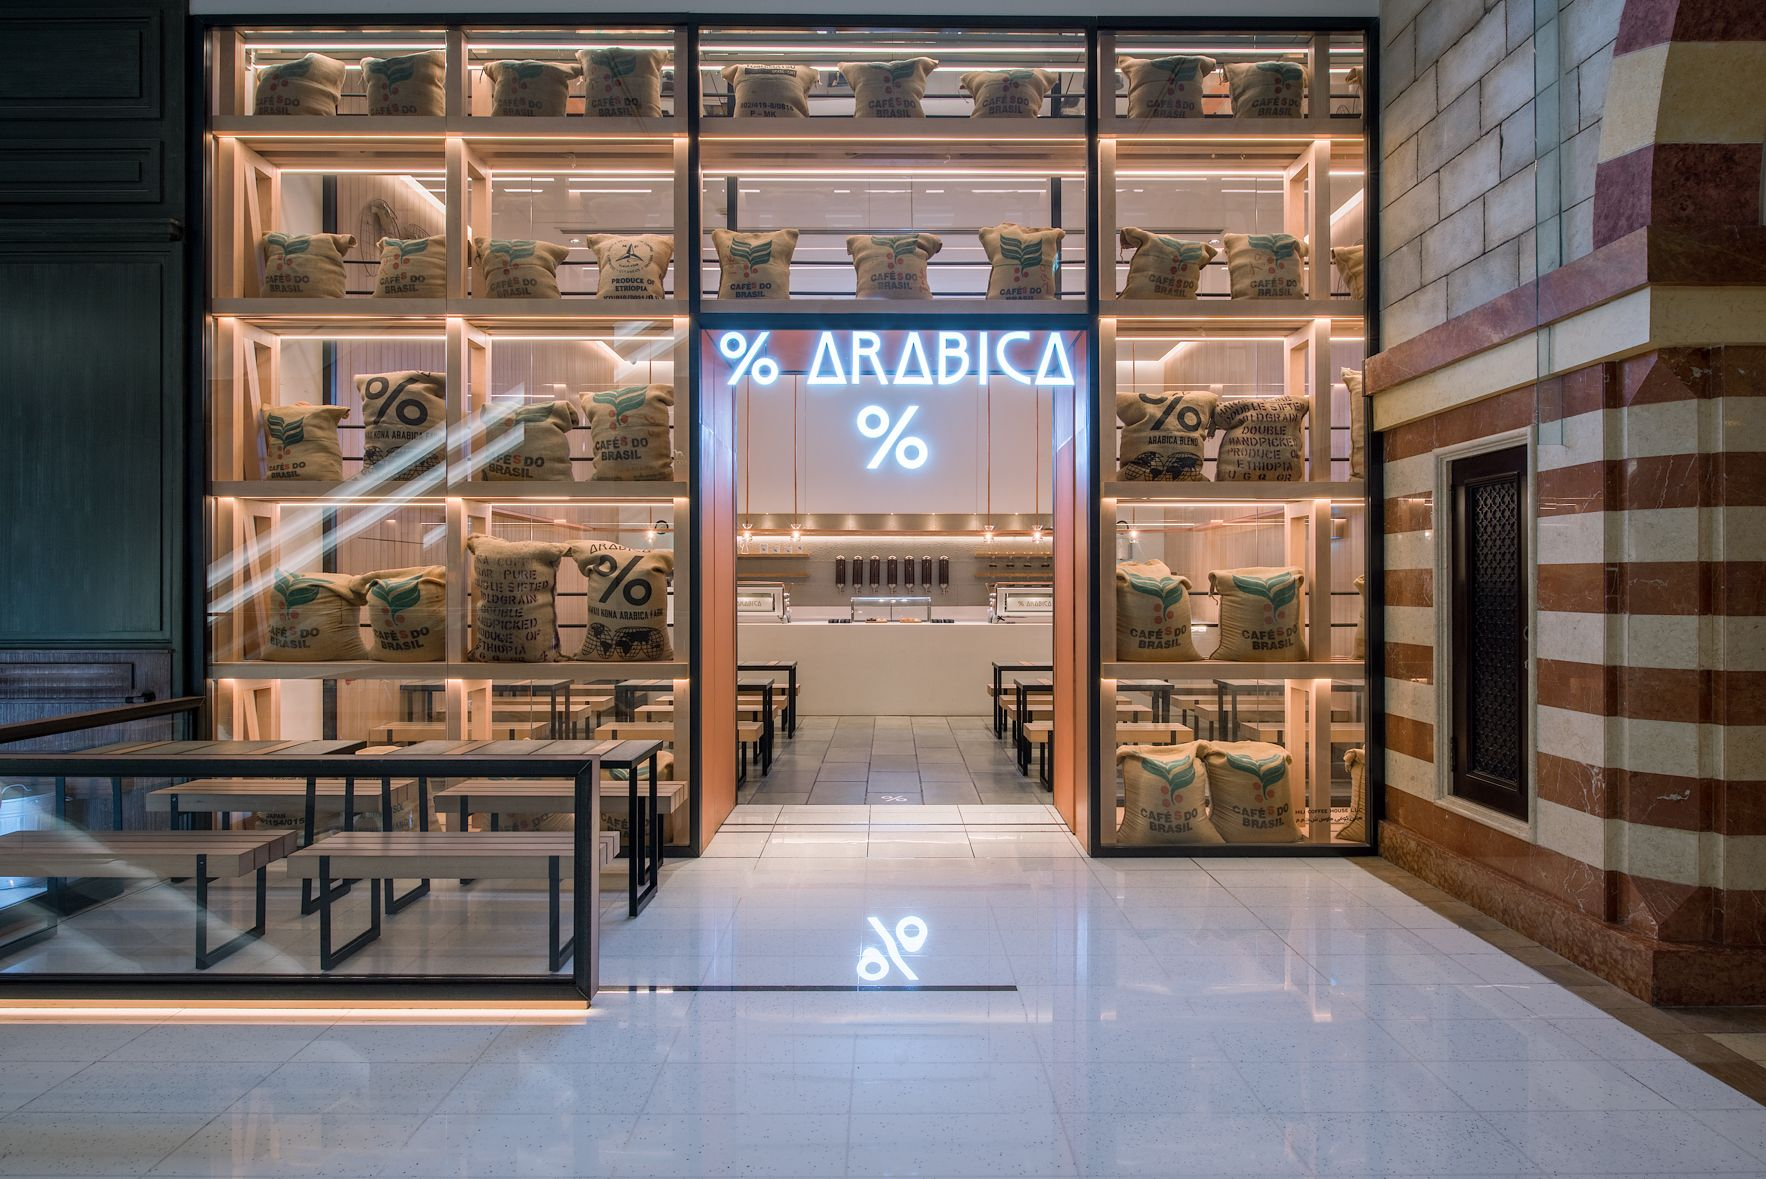 Arabica Dubai Mall Storefront In 2019 Cafe Shop